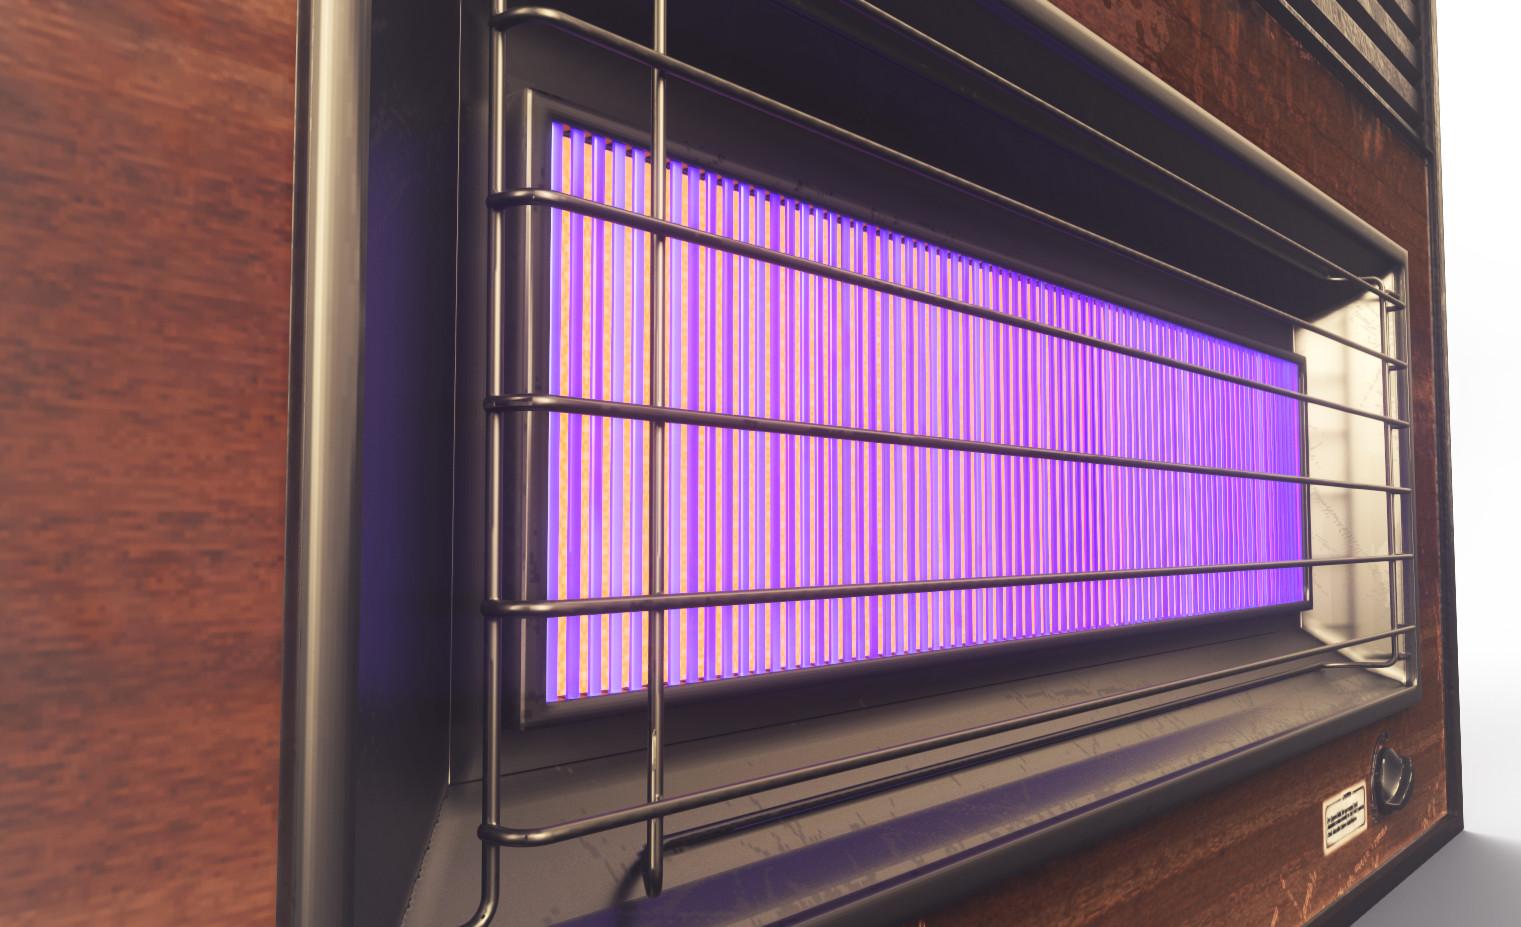 Kevin adamovics rinnai rce 318h natural gas fan heater grate